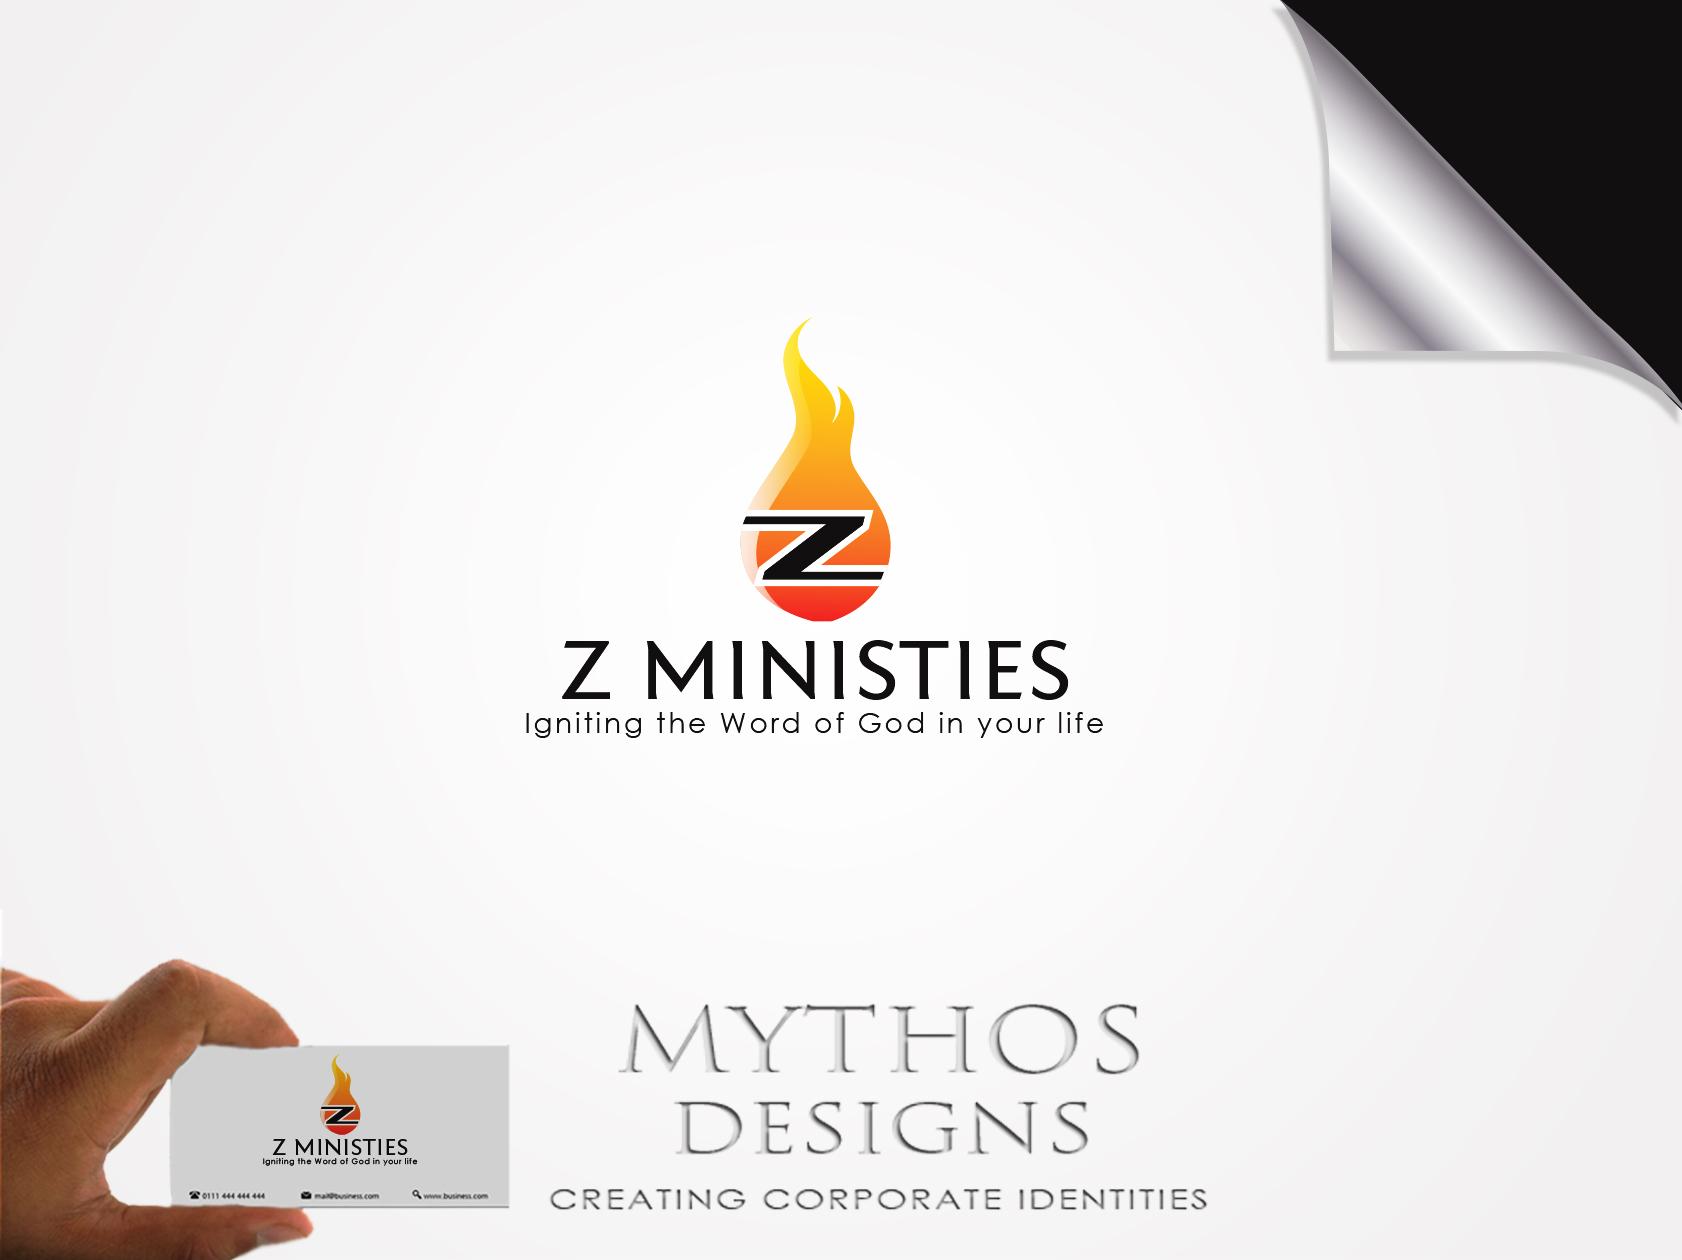 Logo Design by Mythos Designs - Entry No. 136 in the Logo Design Contest Artistic Logo Design for Z Ministries.